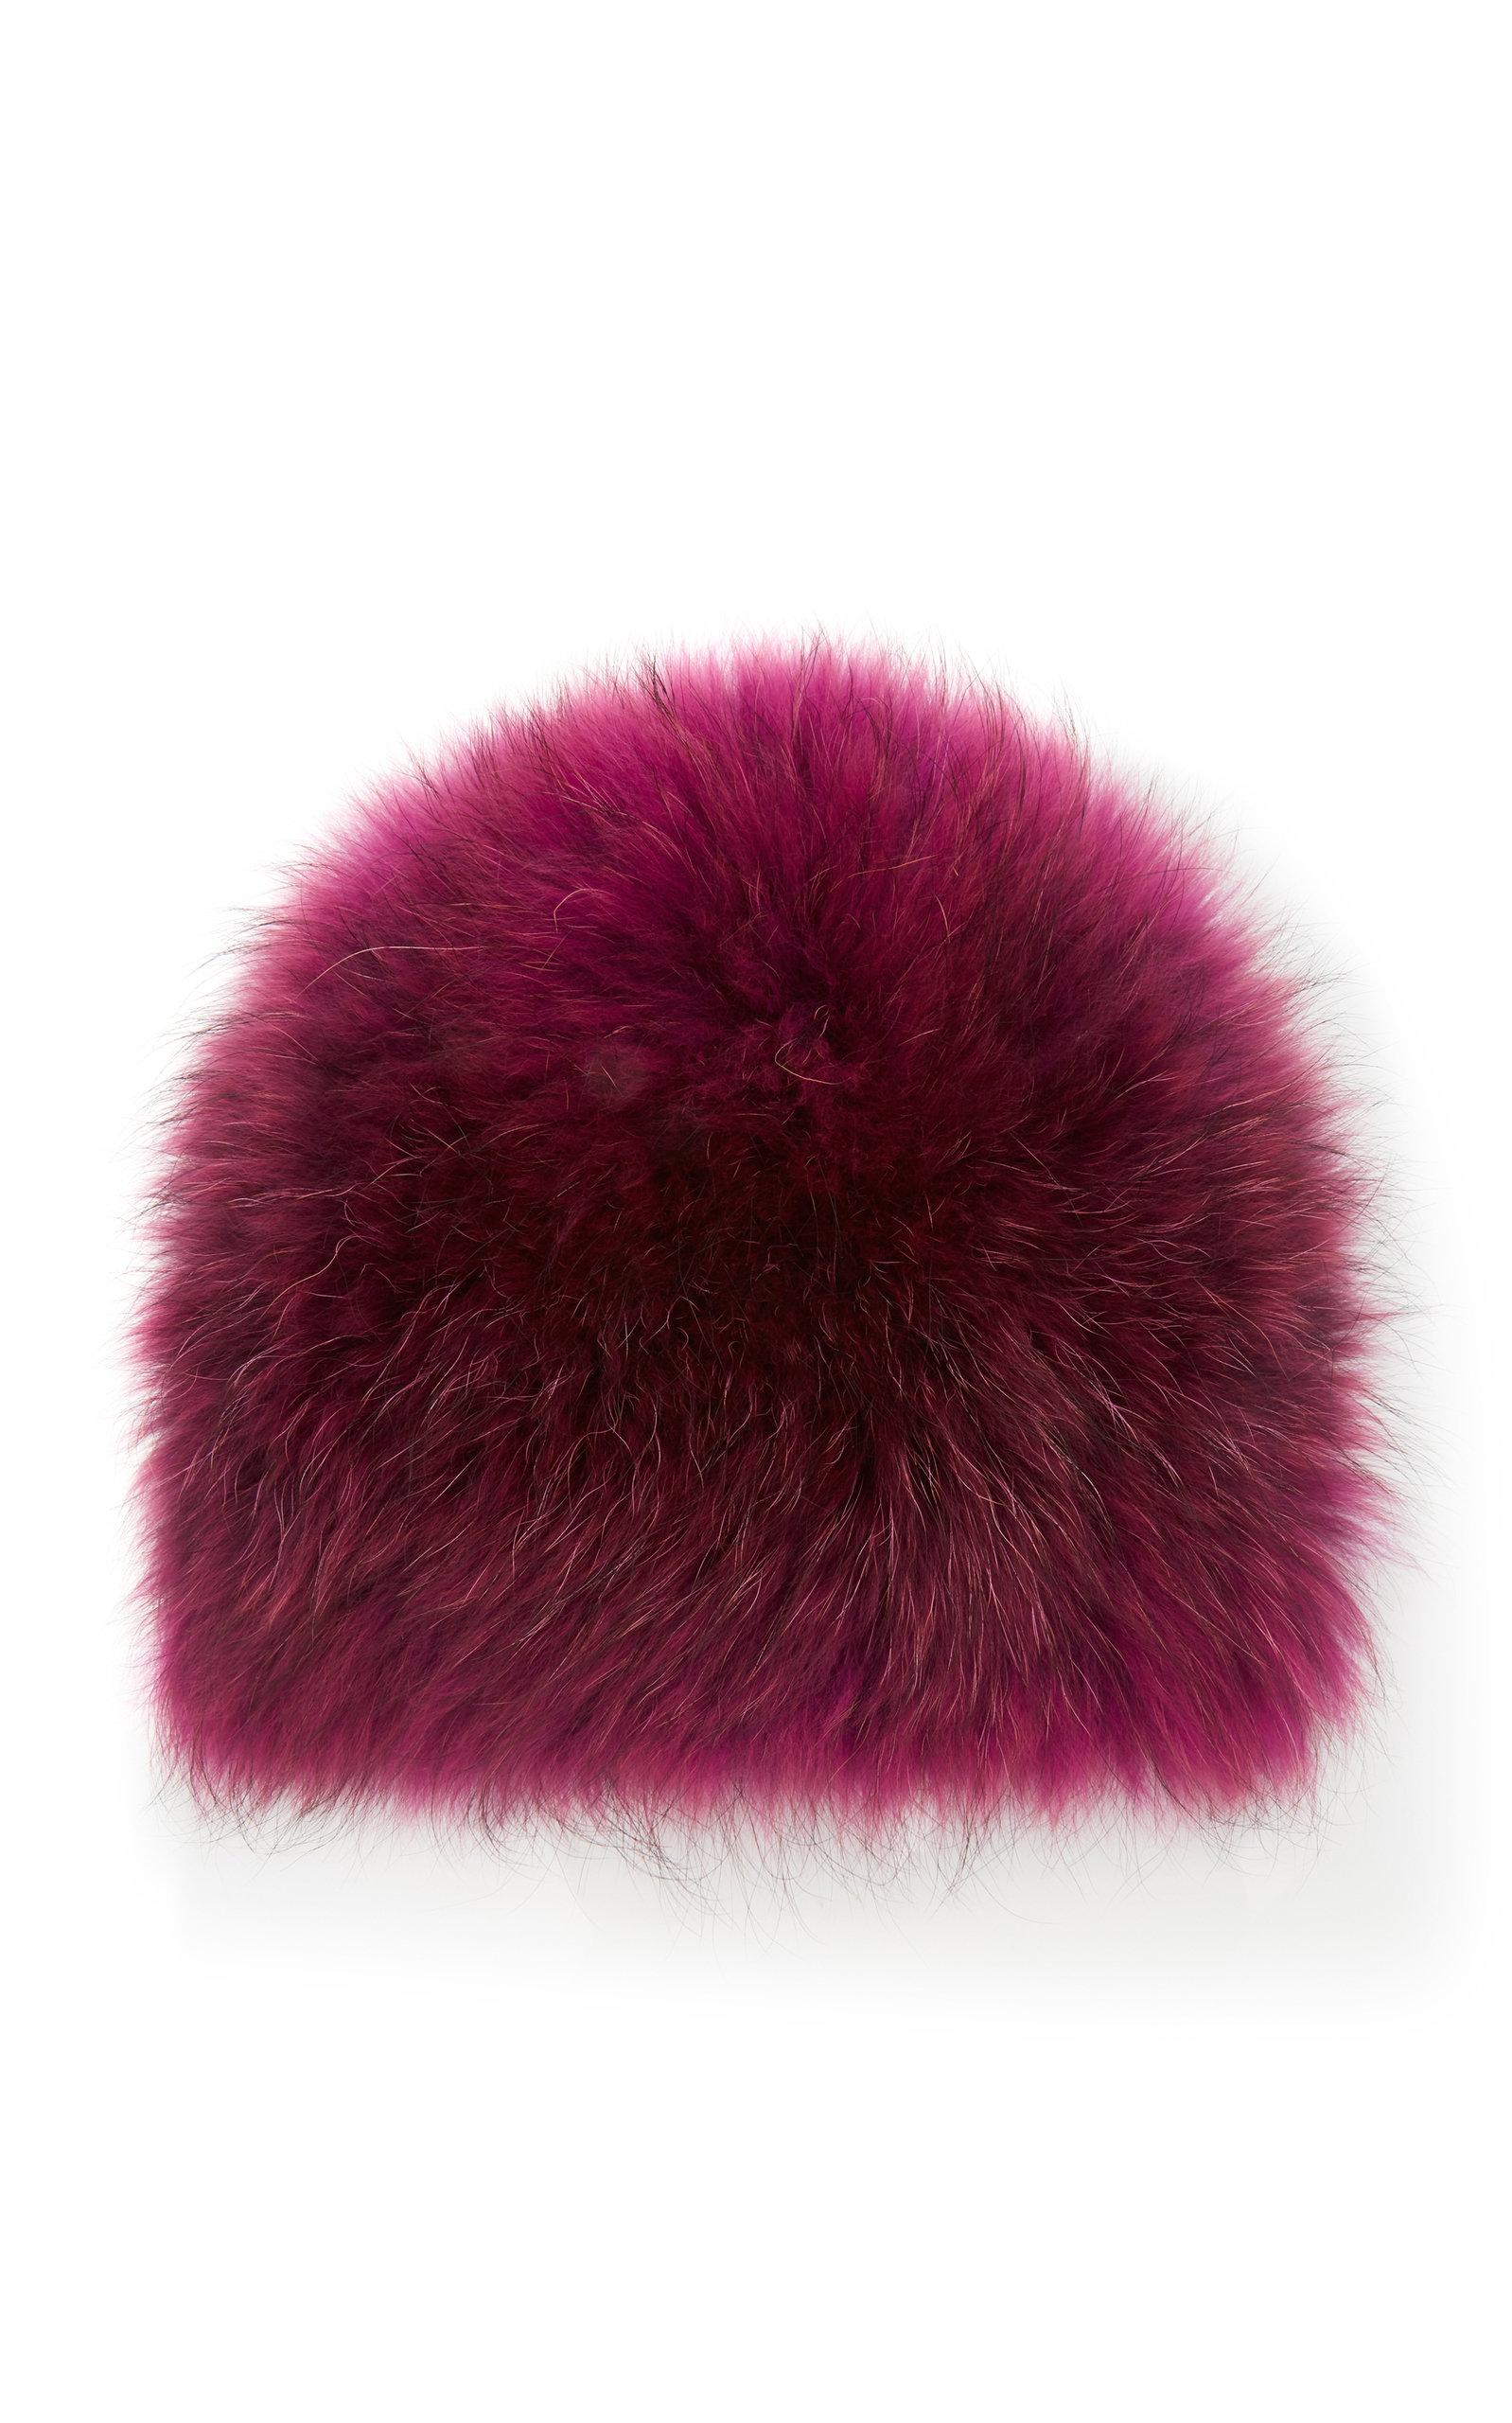 YESTADT MILLINERY Le Fluff Fox Fur Beanie in Pink